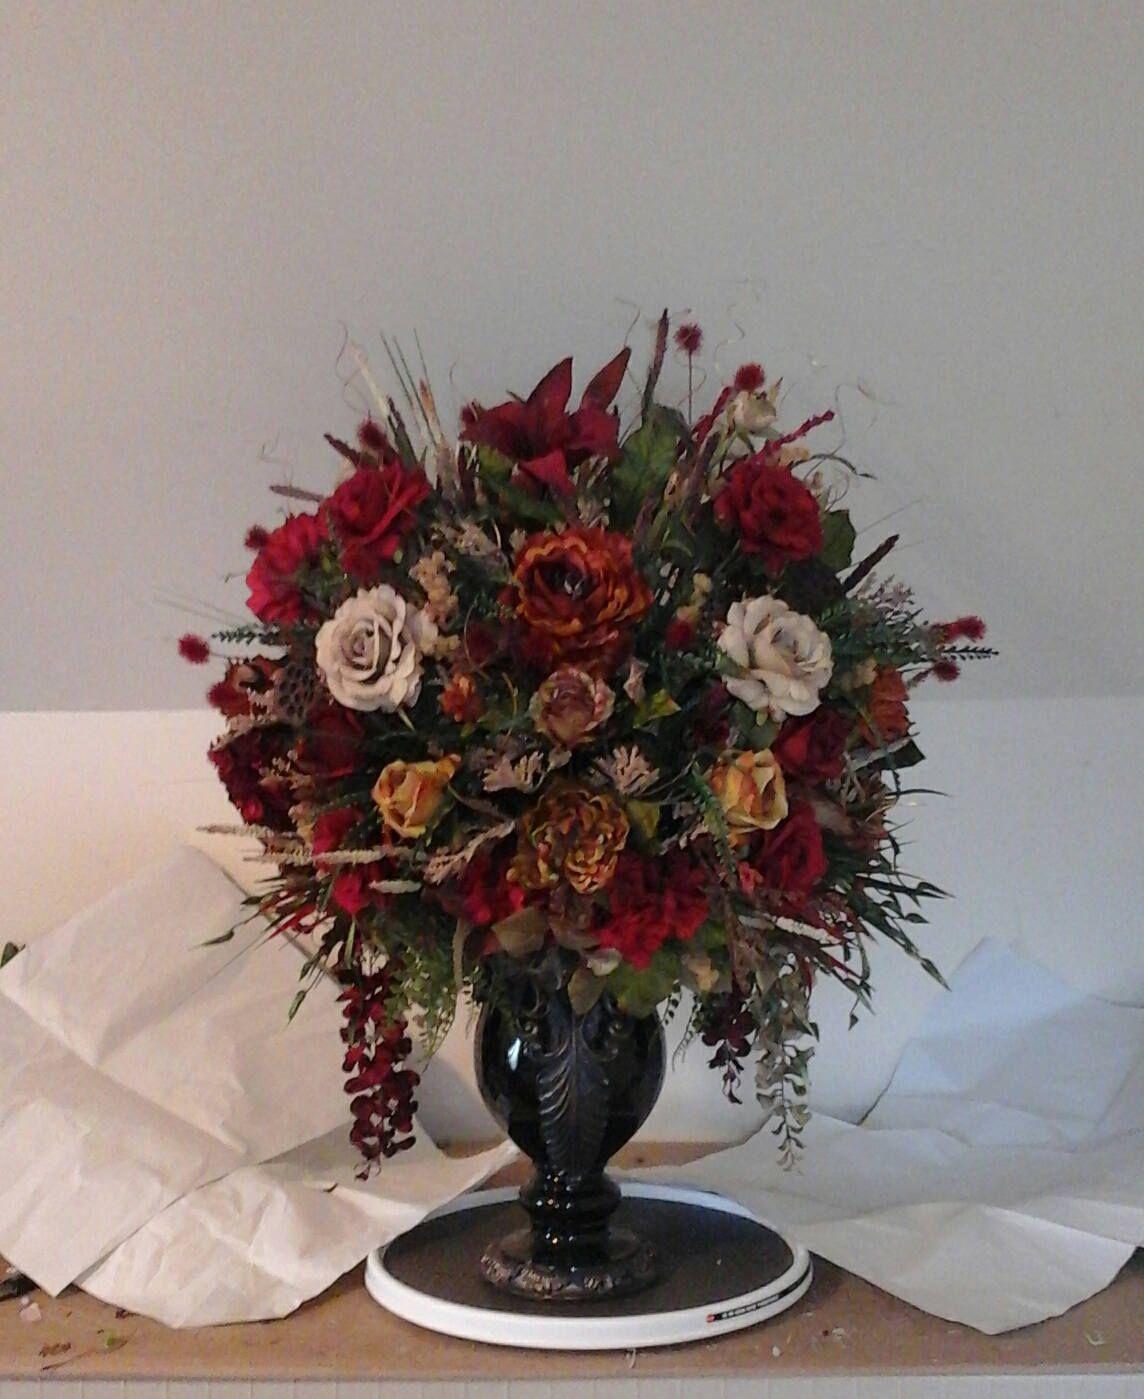 Floral Arrangement Xl Tuscan Silk Centerpiece Shipping Etsy Silk Flower Centerpieces Home Floral Arrangements Floral Arrangements